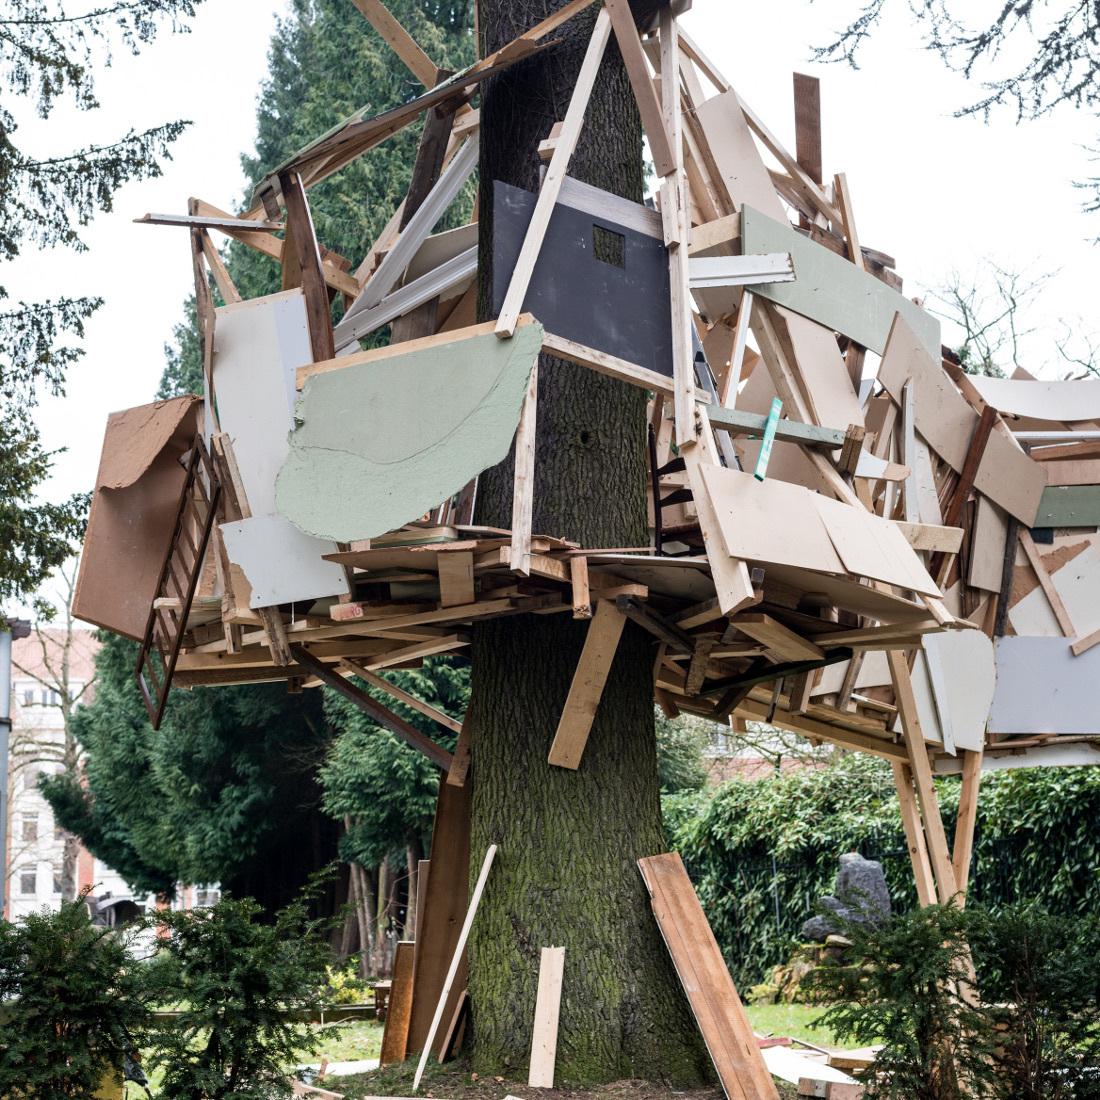 Tatiana Wolska, Melancholia, installation view, 2018, Boghossian Foundation, Brussels